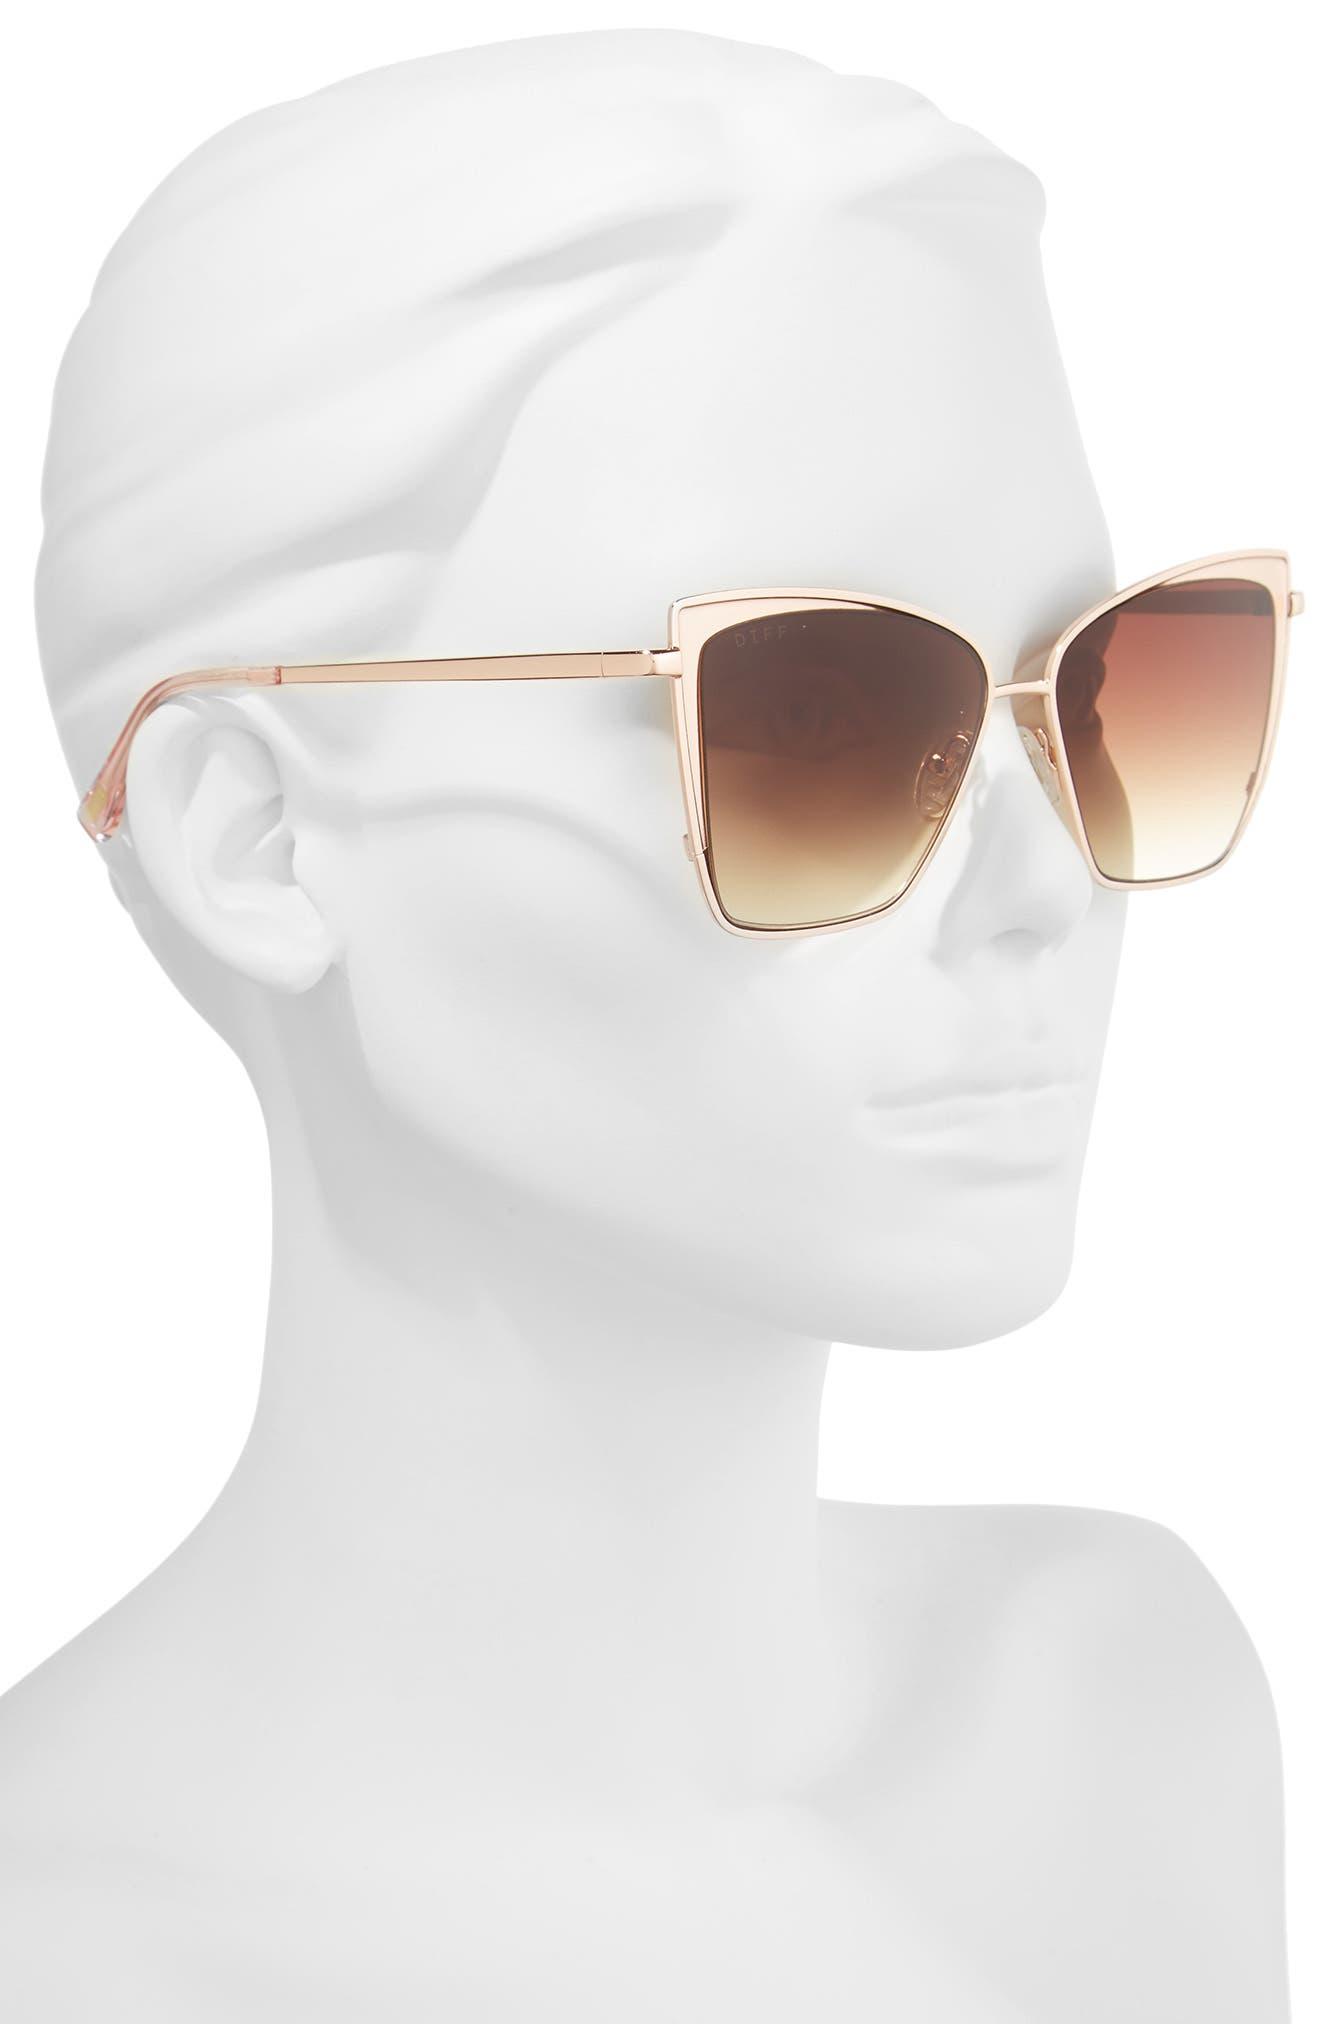 501b28728d1 DIFF Sunglasses for Women